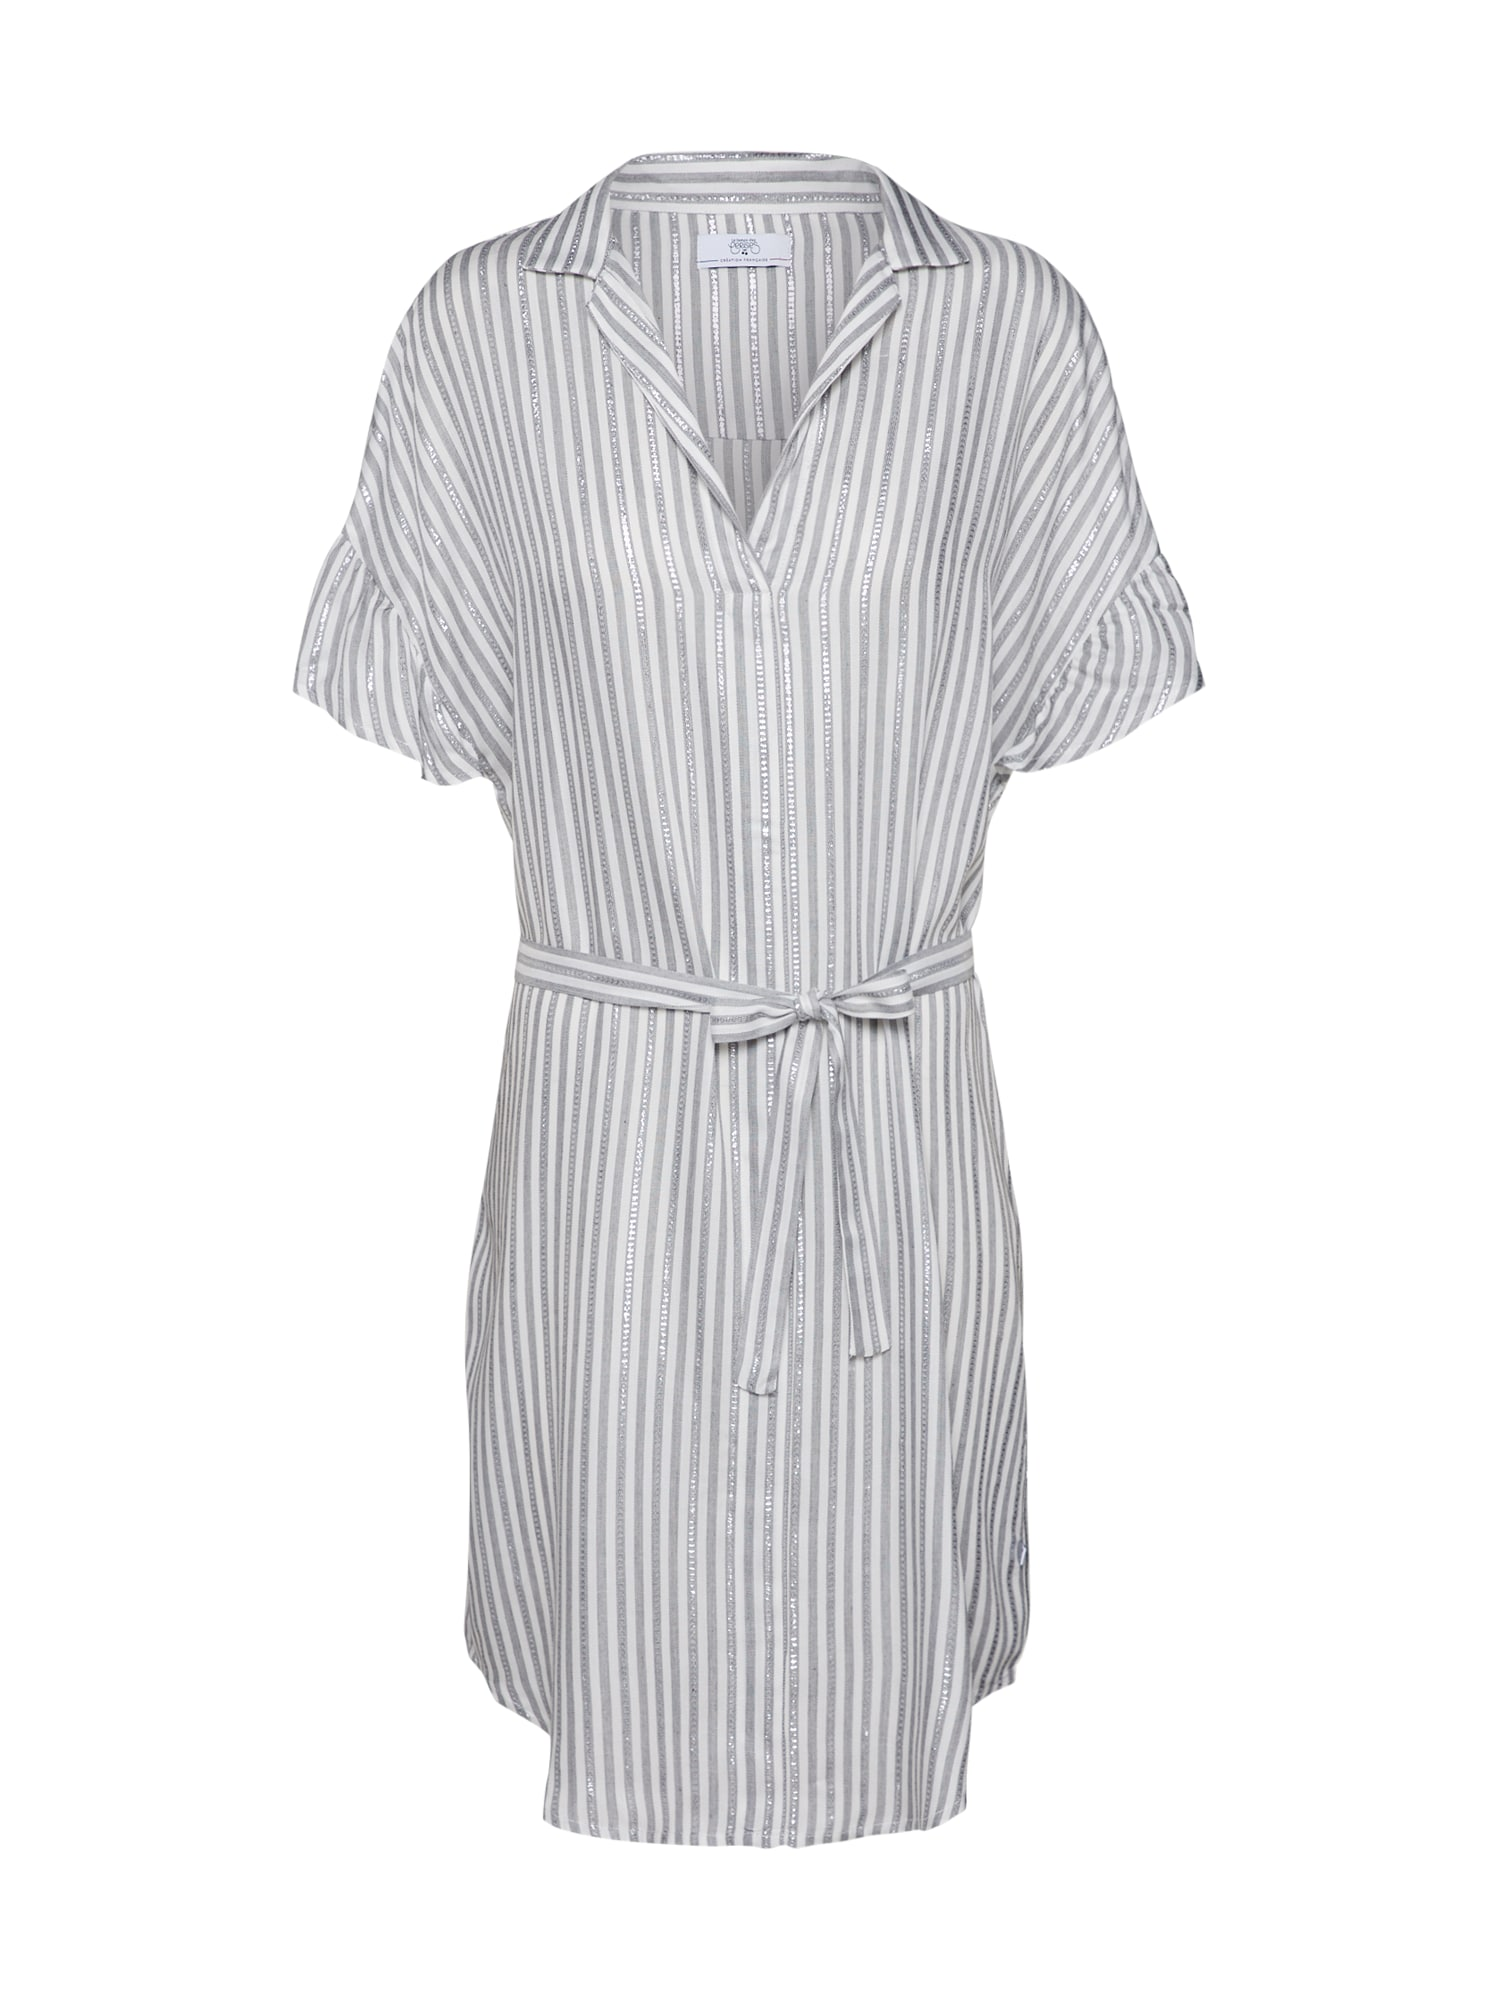 Košilové šaty PAULA šedá bílá Le Temps Des Cerises